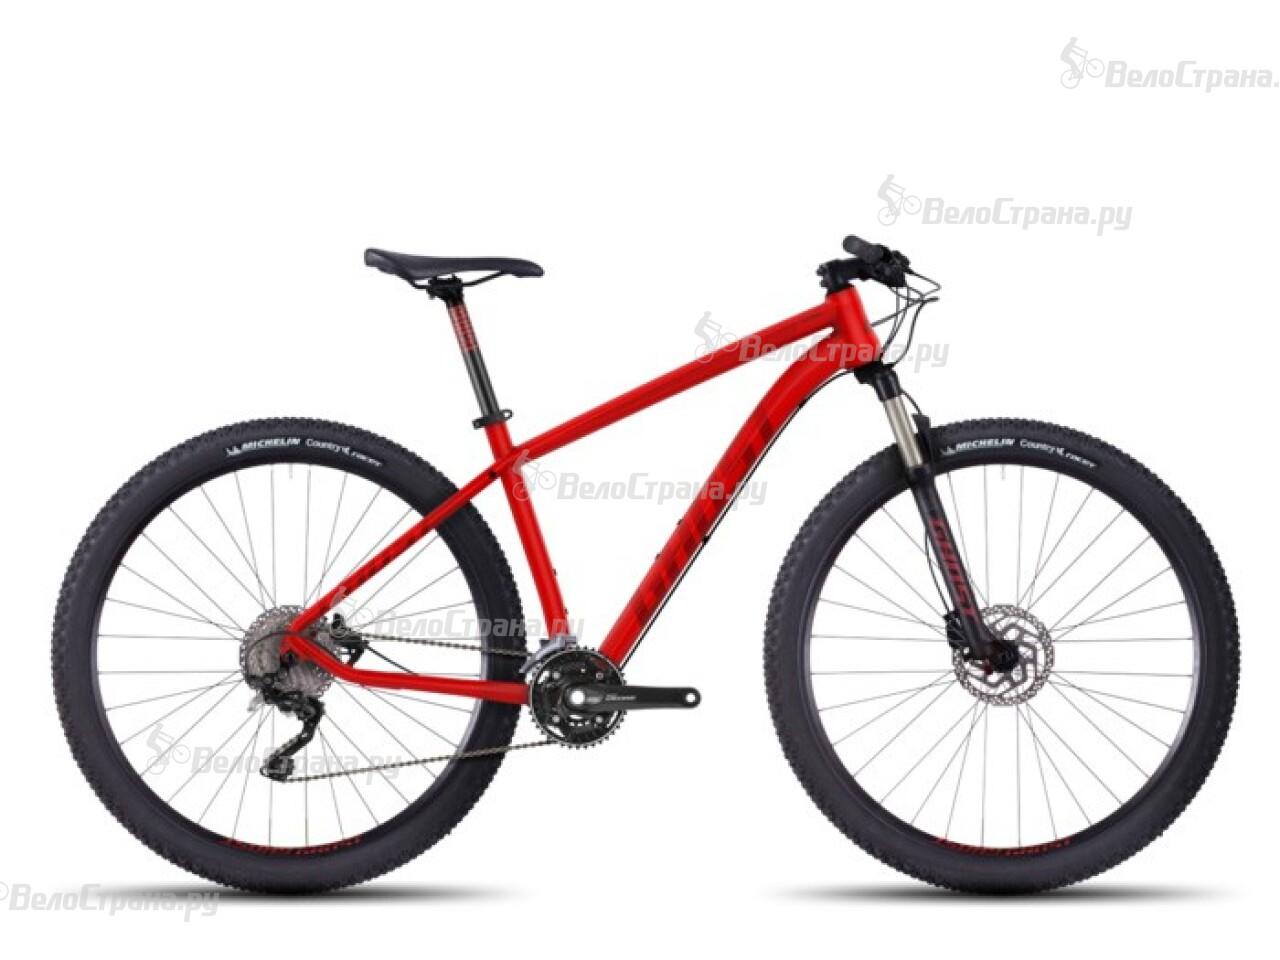 Велосипед Ghost Tacana 5 (2016) цены онлайн